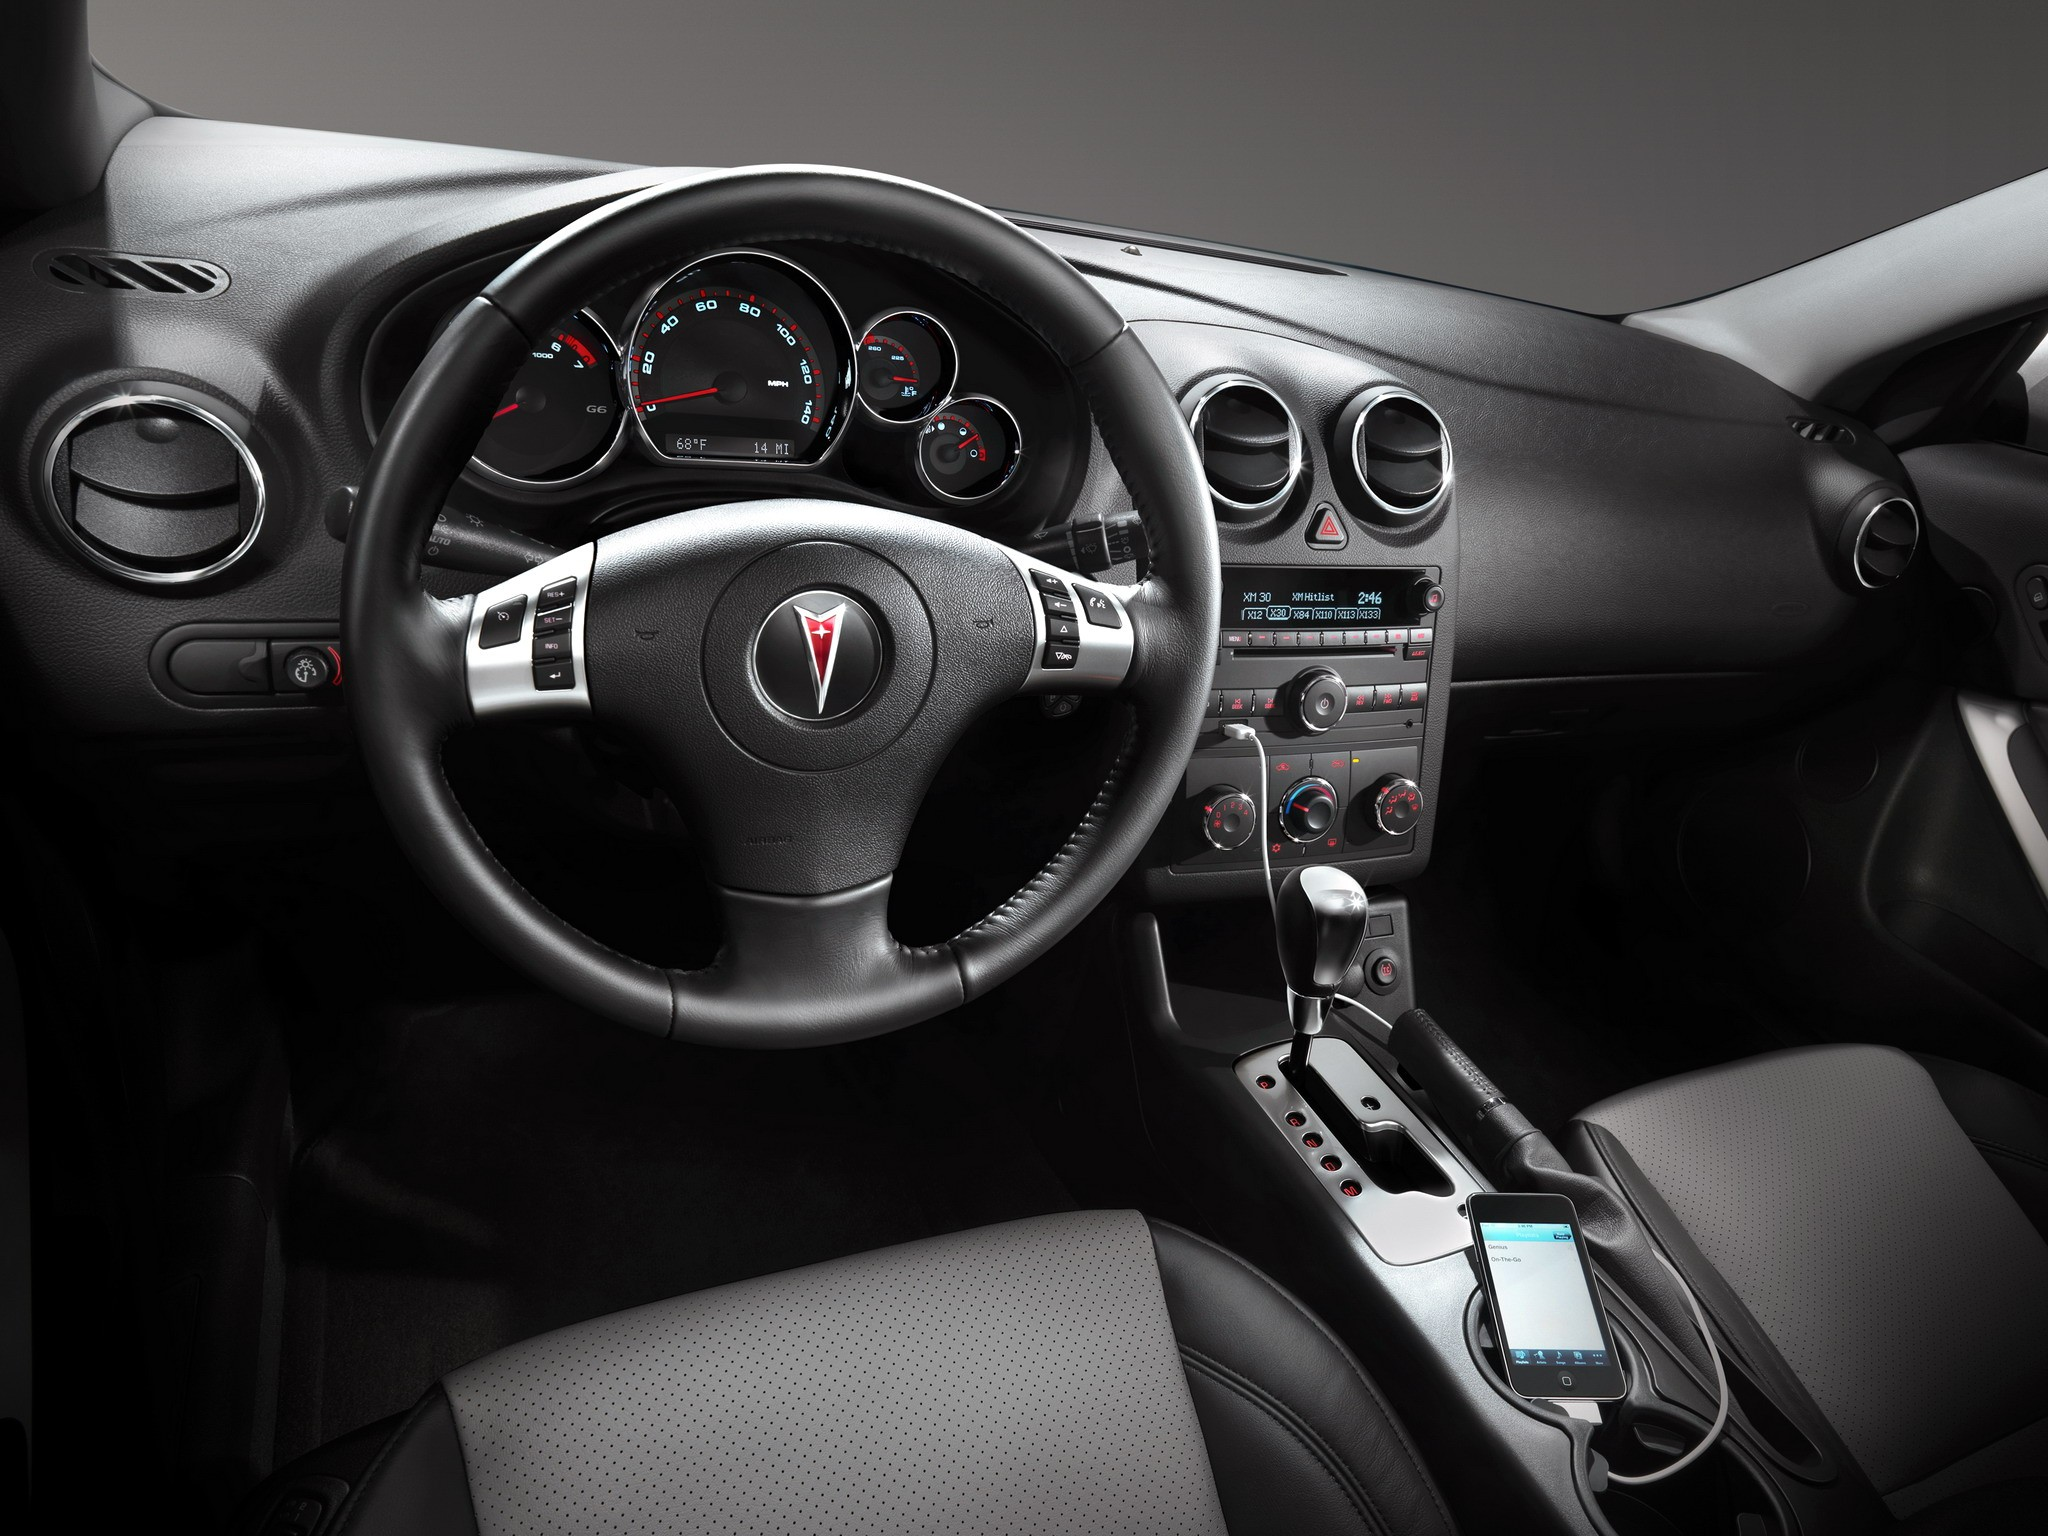 2011 Scion Tc Specs >> PONTIAC G6 Coupe - 2008, 2009, 2010 - autoevolution